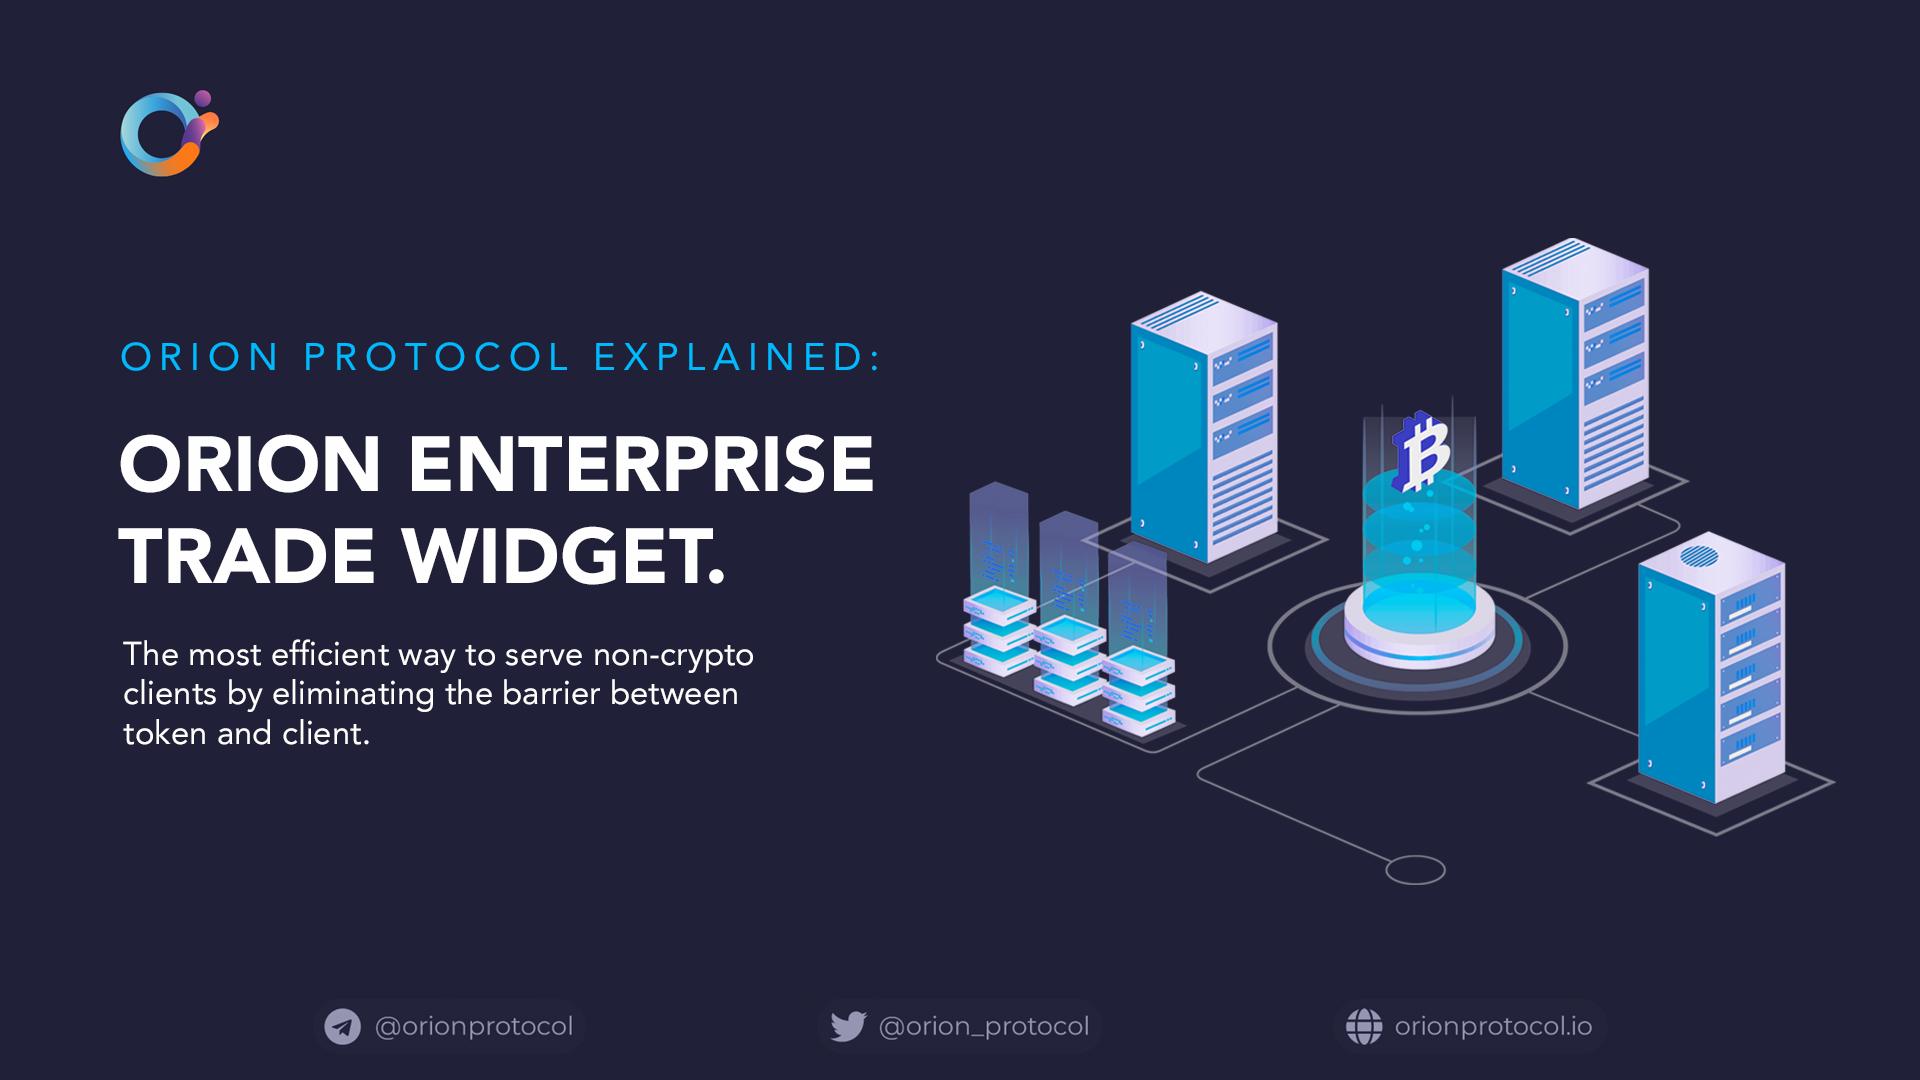 Orion Enterprise Trade Widget: Explained